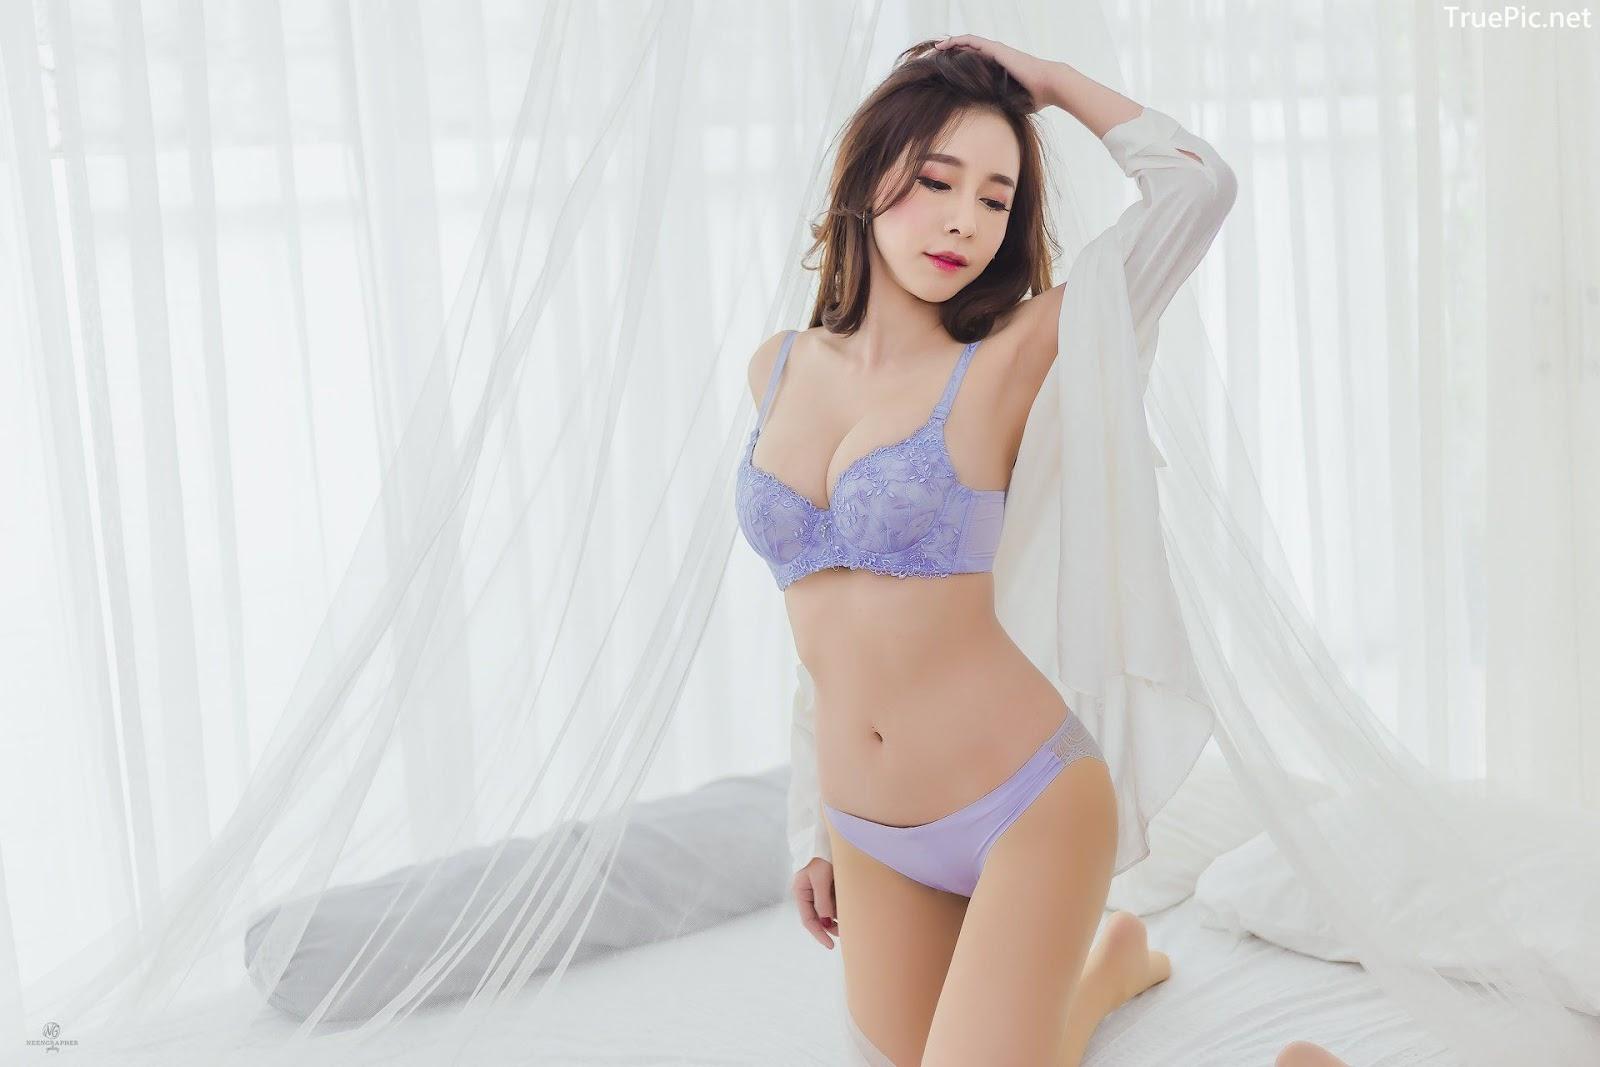 Image-Thailand-Hot-Model-Skykikijung-Purple-Lingerie-TruePic.net- Picture-3